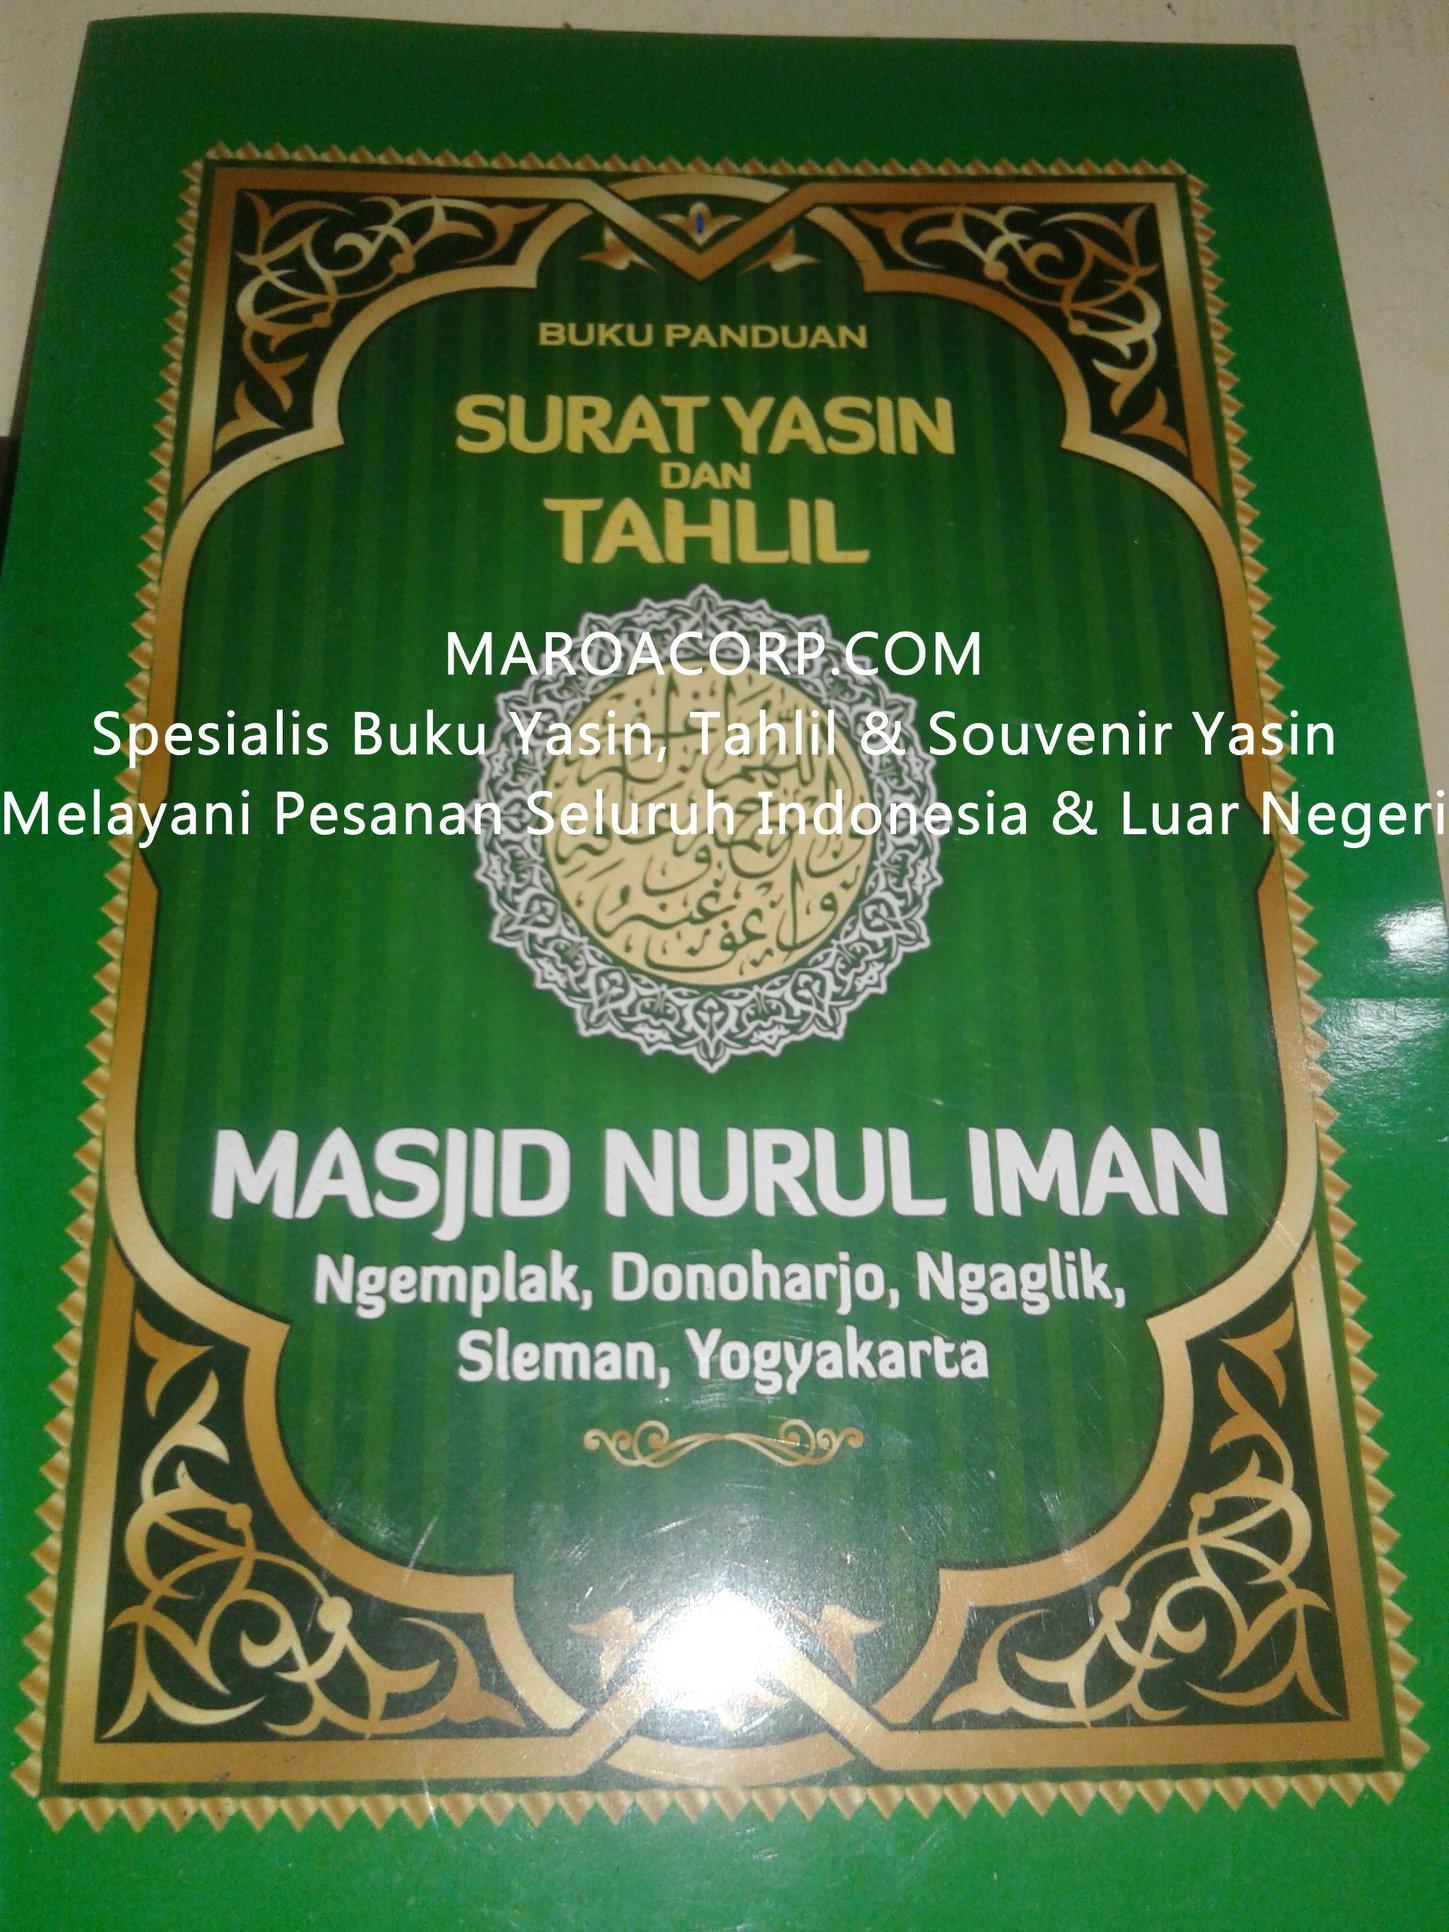 Toko Buku Yasin Kulonprogo Jogjakarta Maroacorpcom